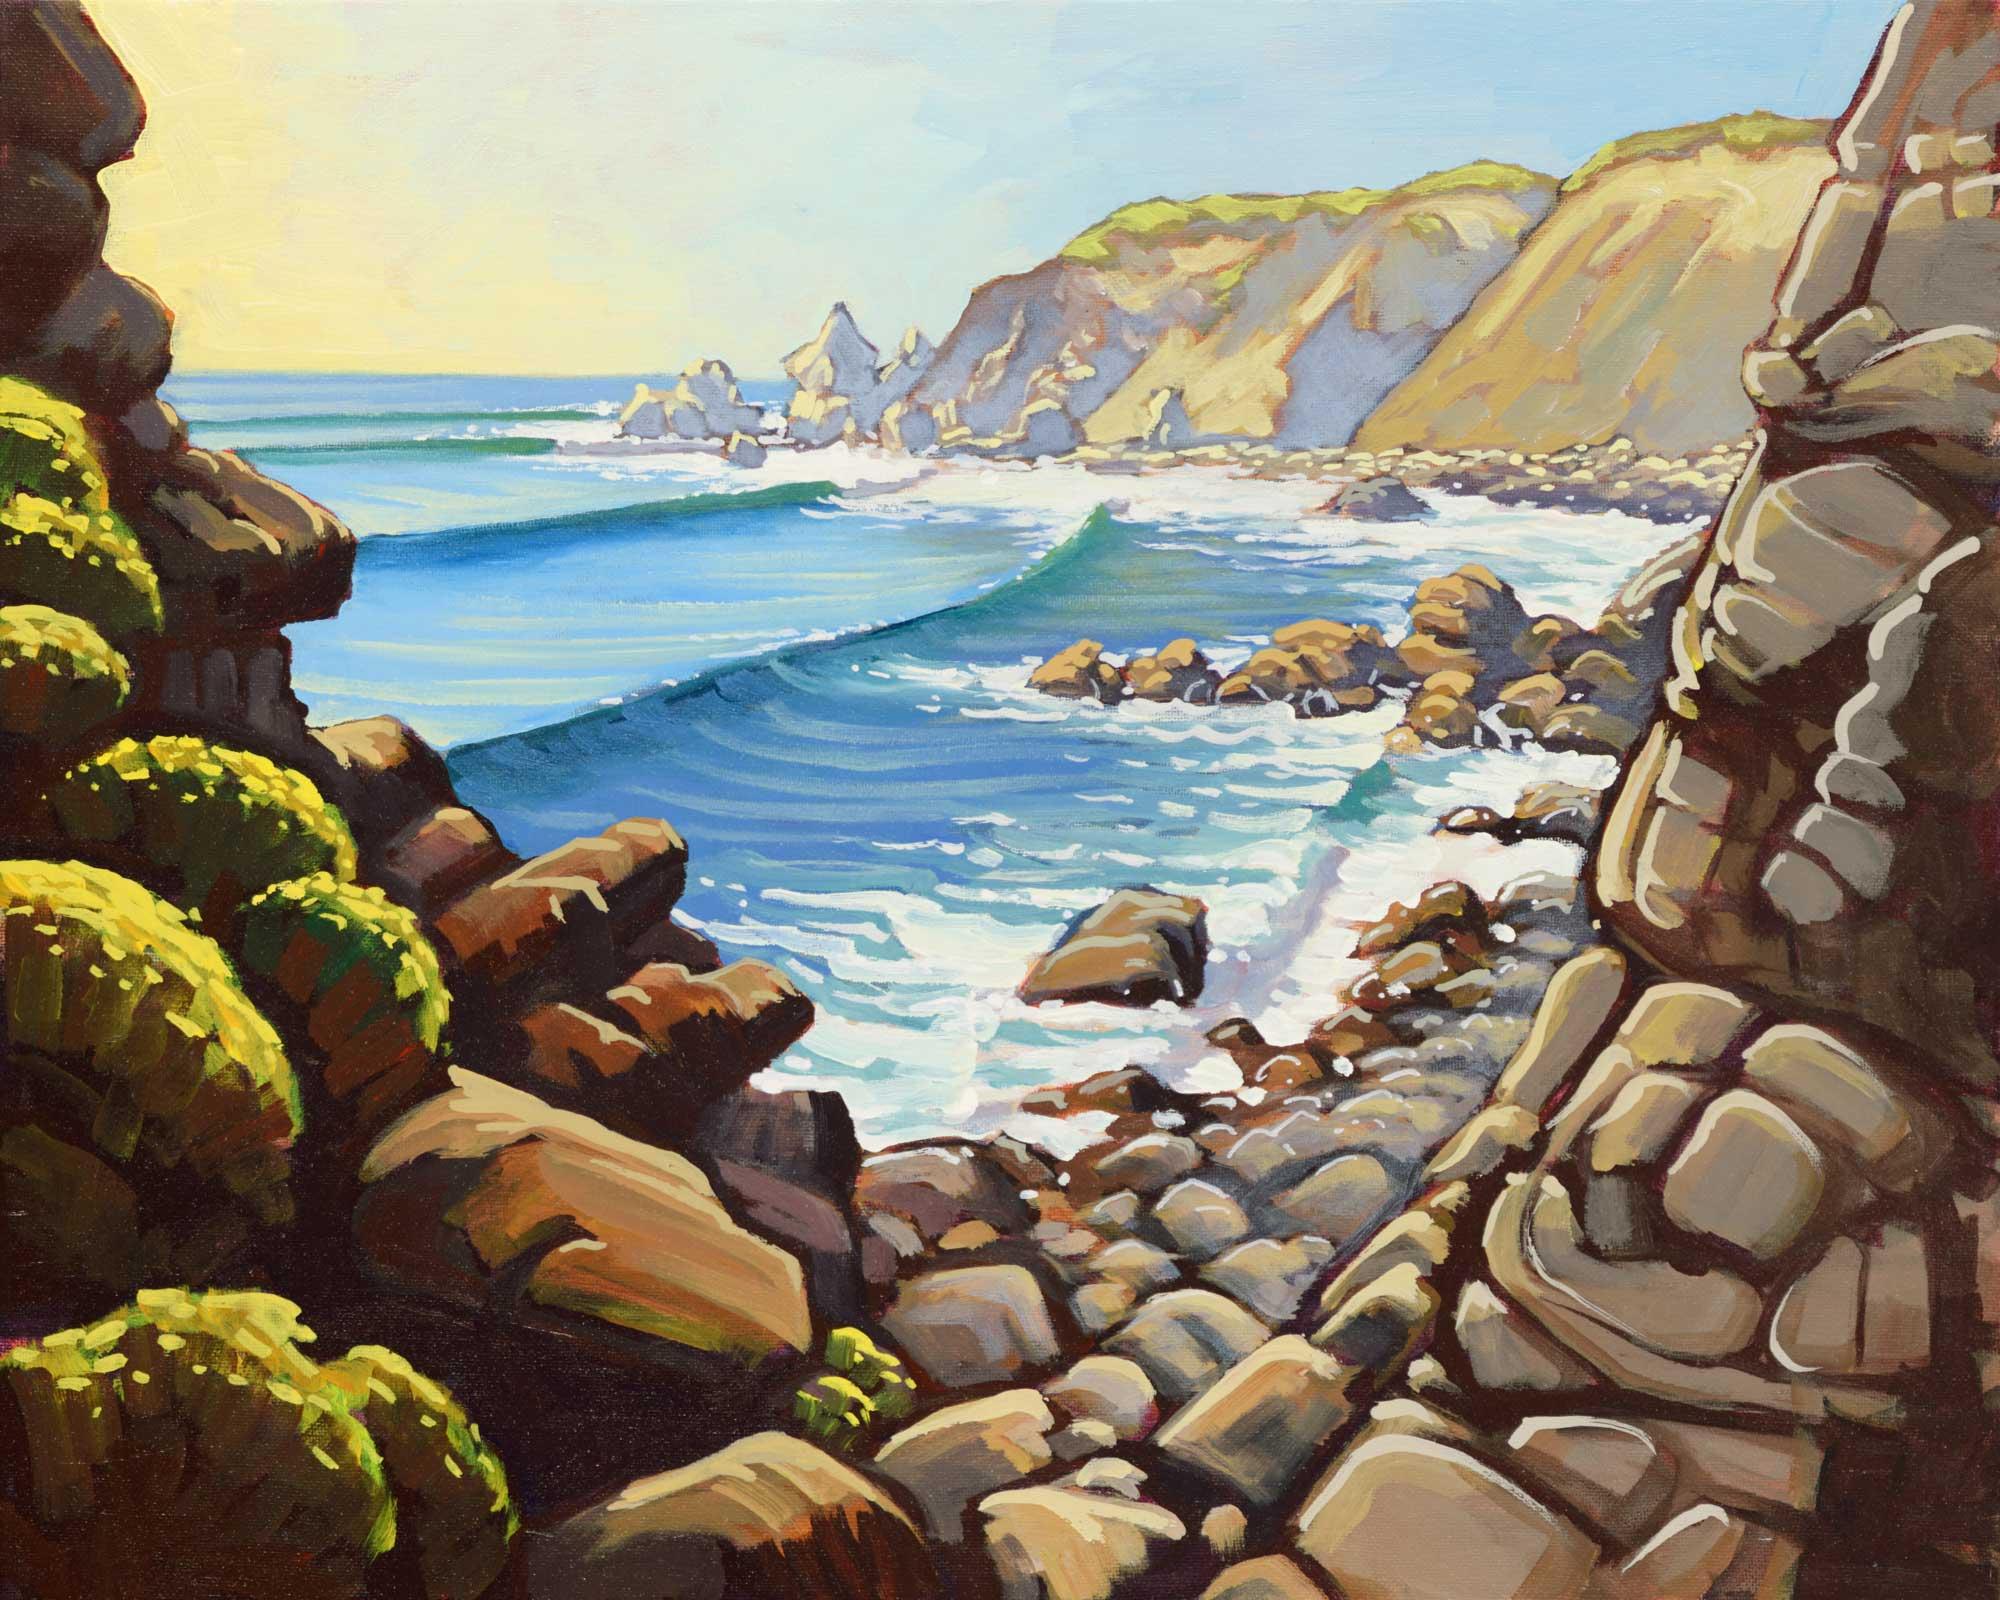 Plein air artwork from the Sonoma coast of Northern California